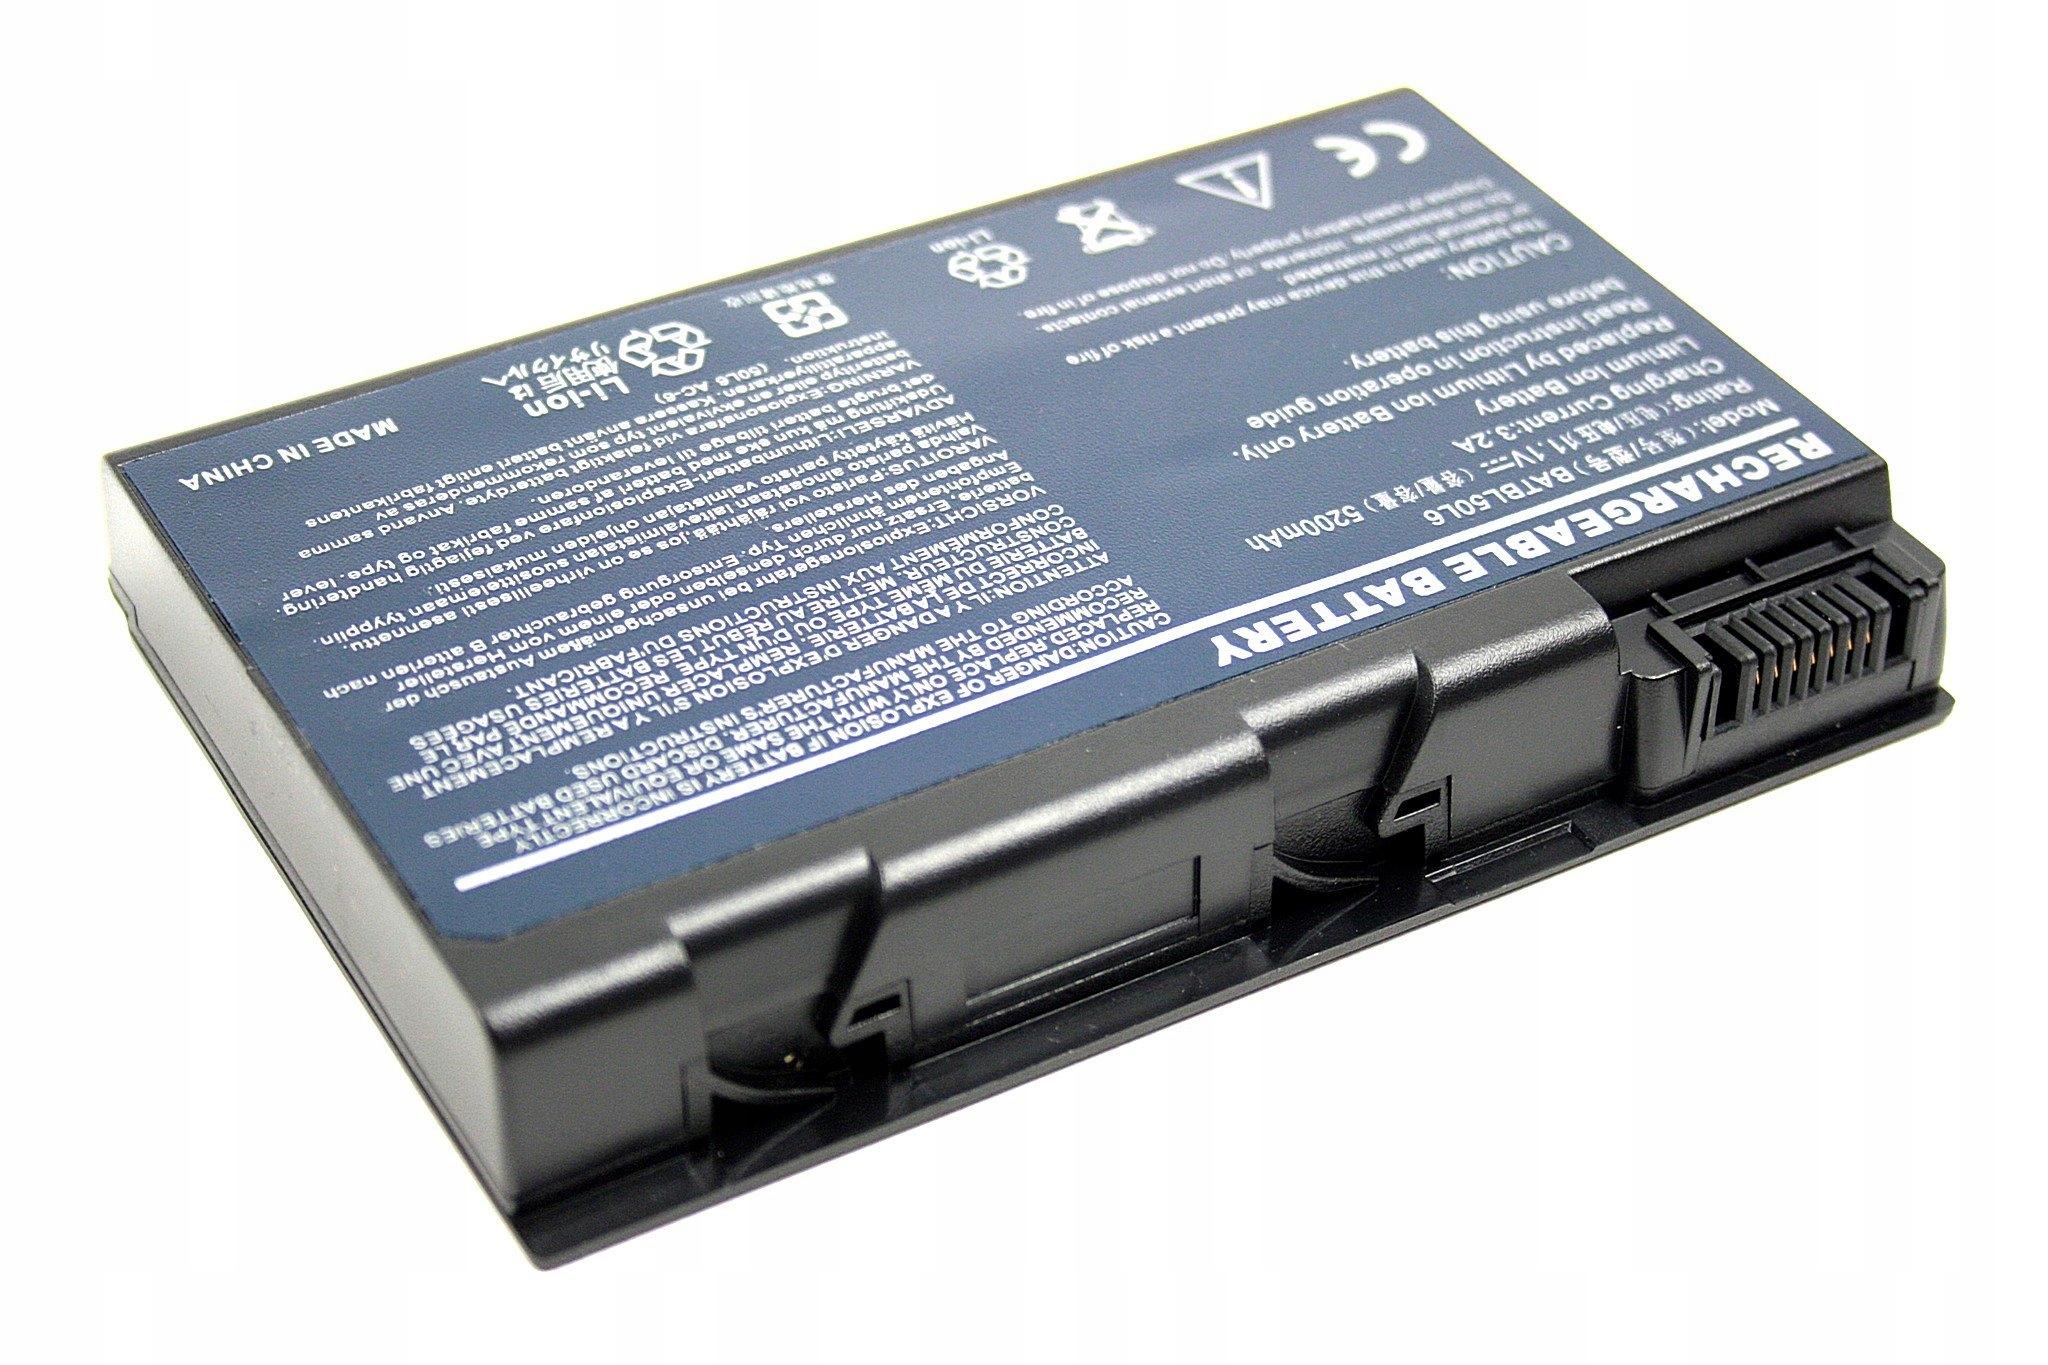 BATERIA AKUMULATOR ACER Aspire 3690 5100 5610 5630 BATBL50L6 - Baterie do laptopów